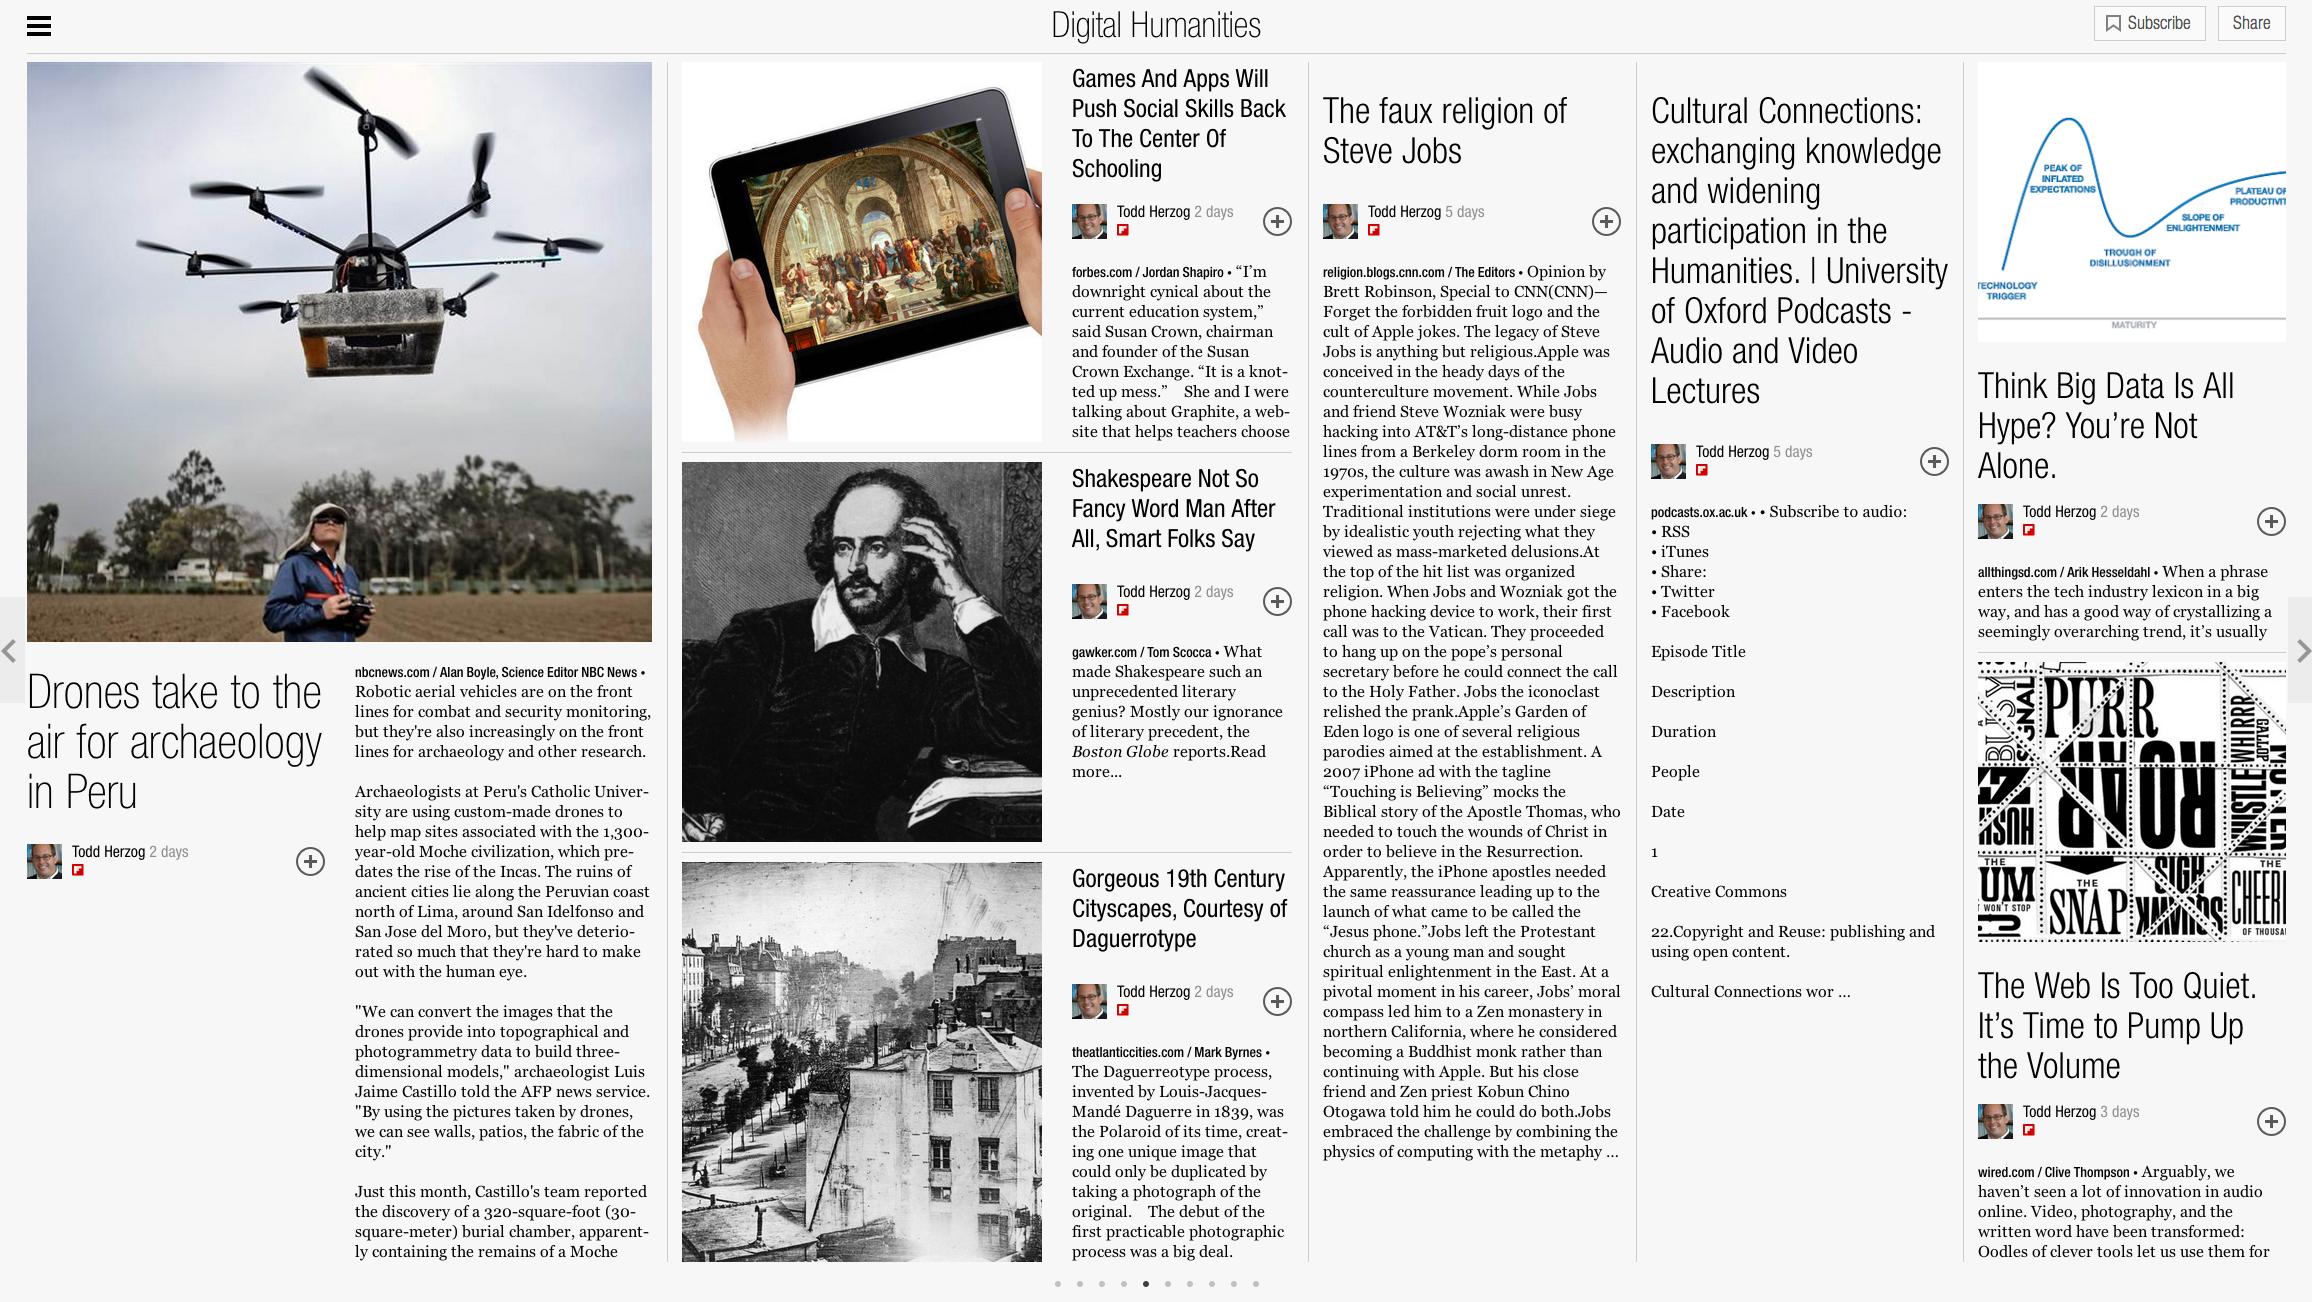 Digital_Humanities_-_Flipboard.png